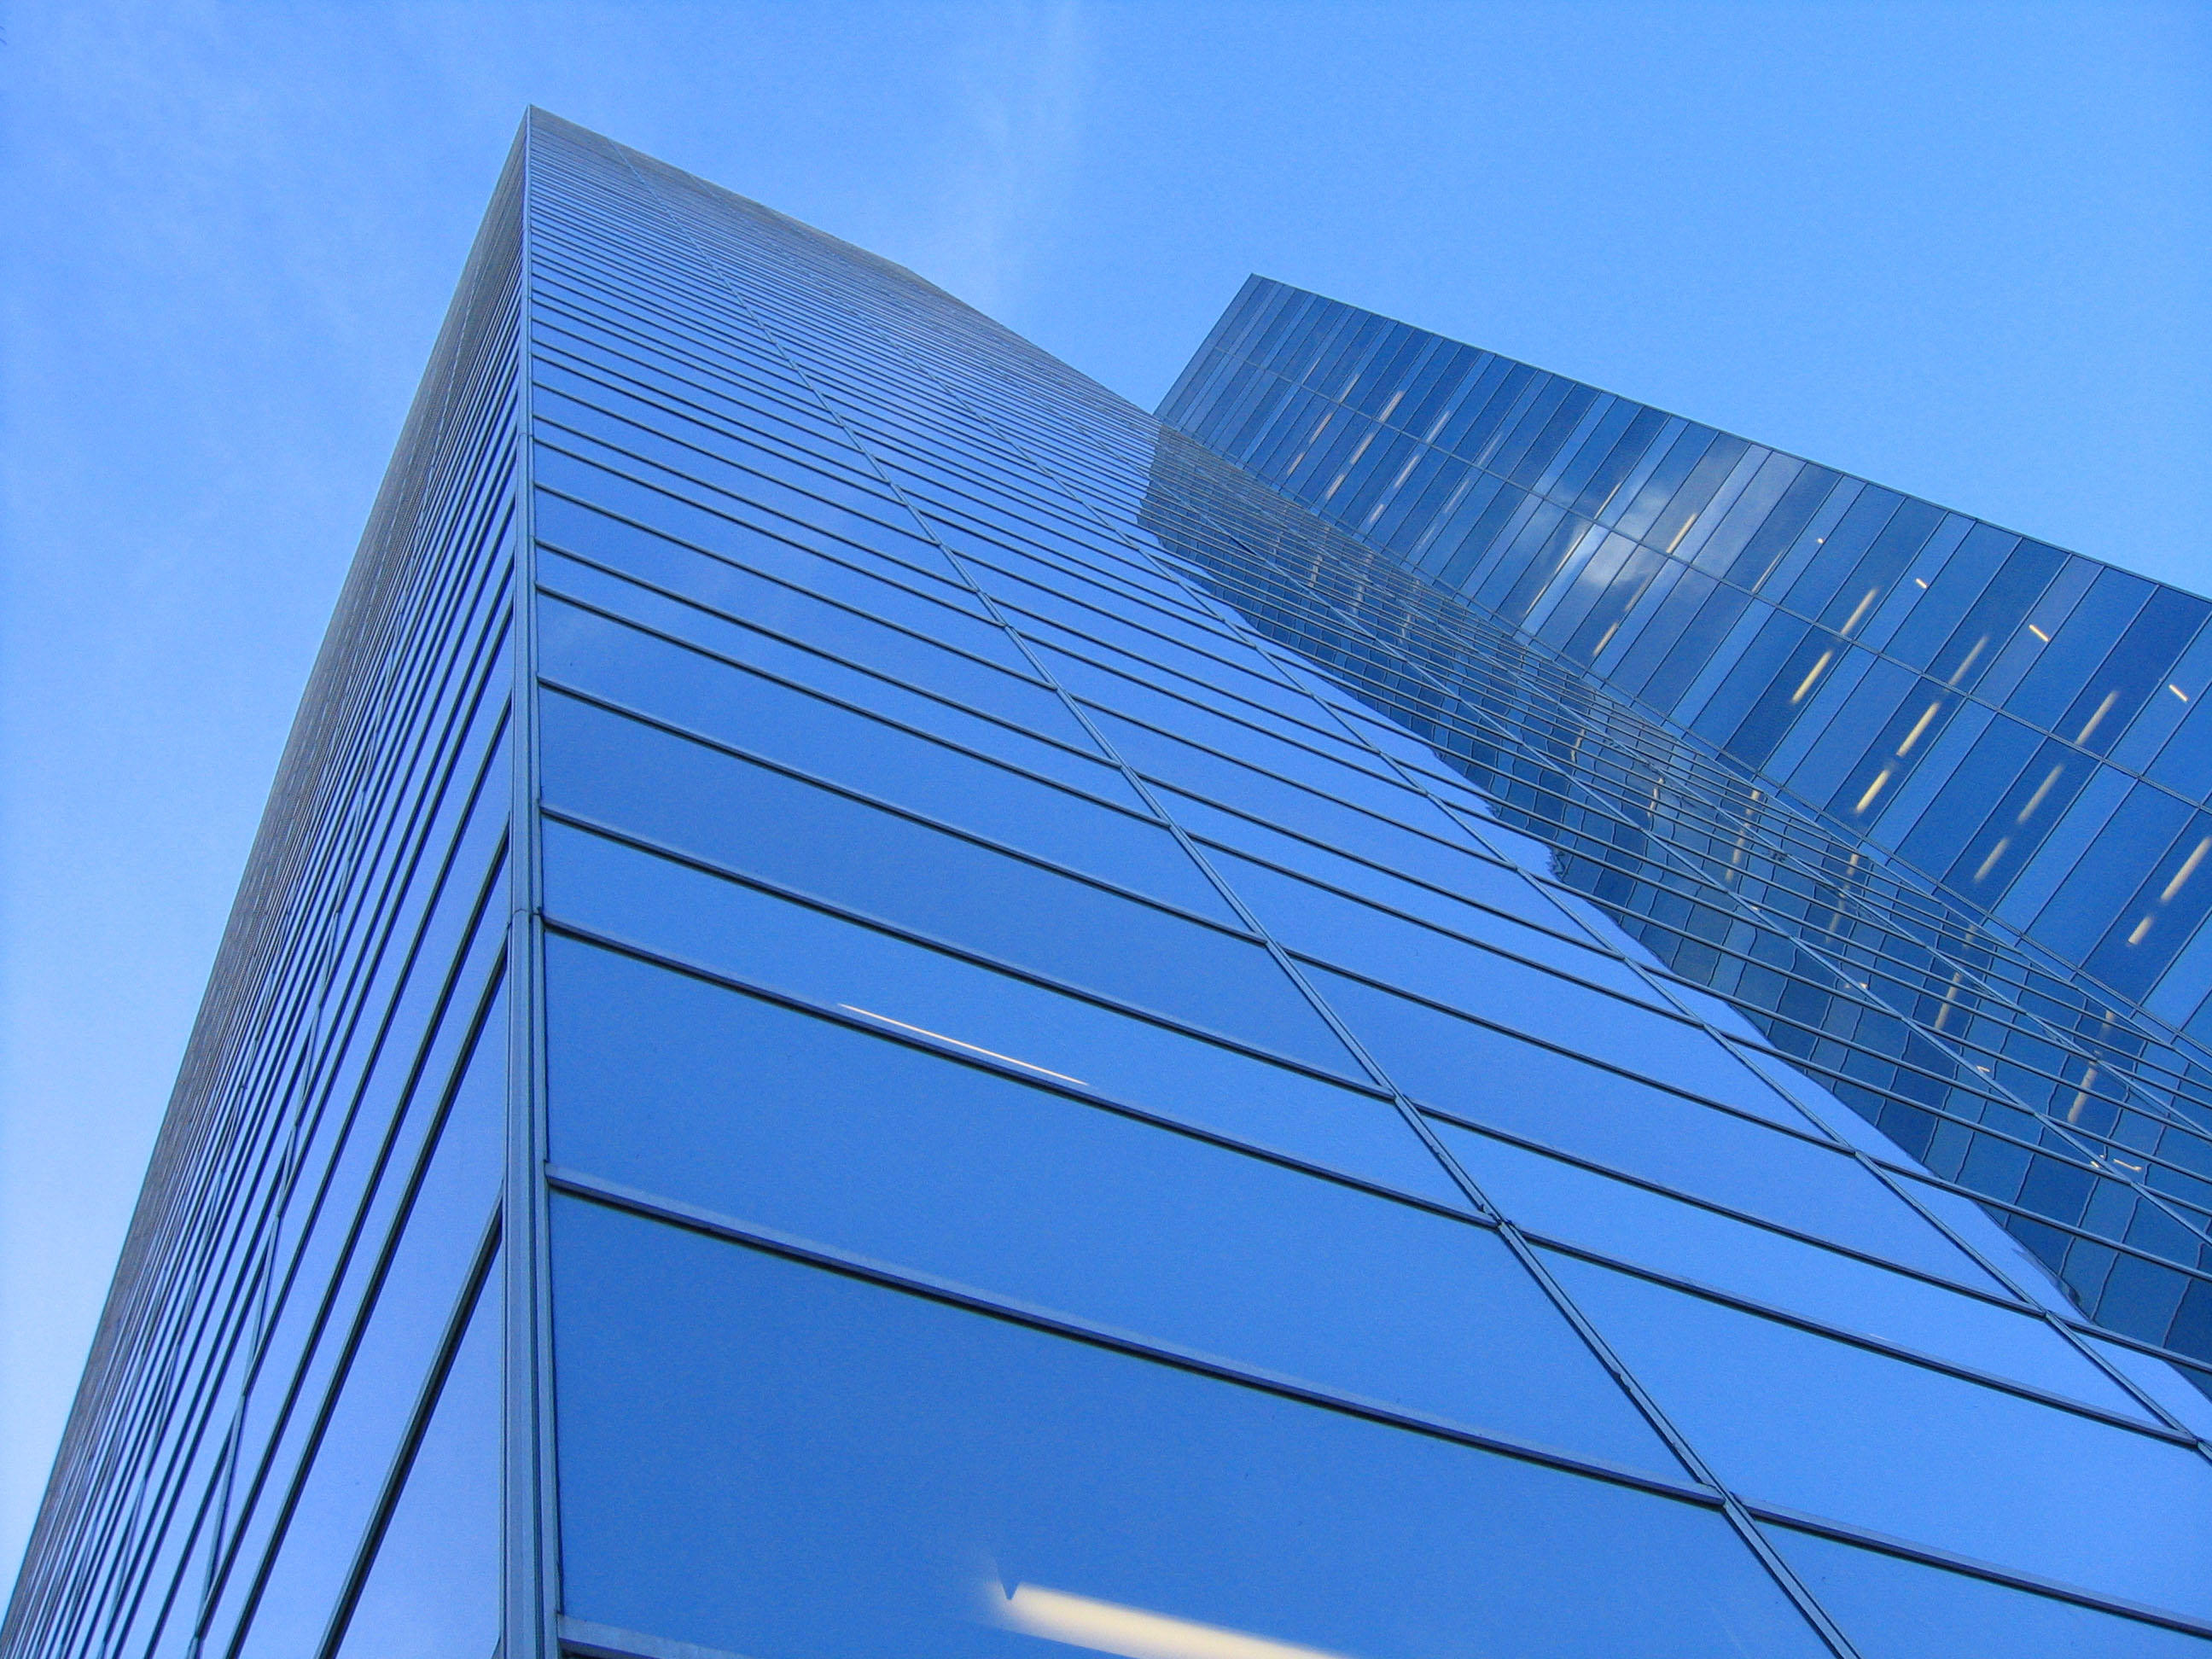 glass building 1 by nedarbstock on DeviantArt